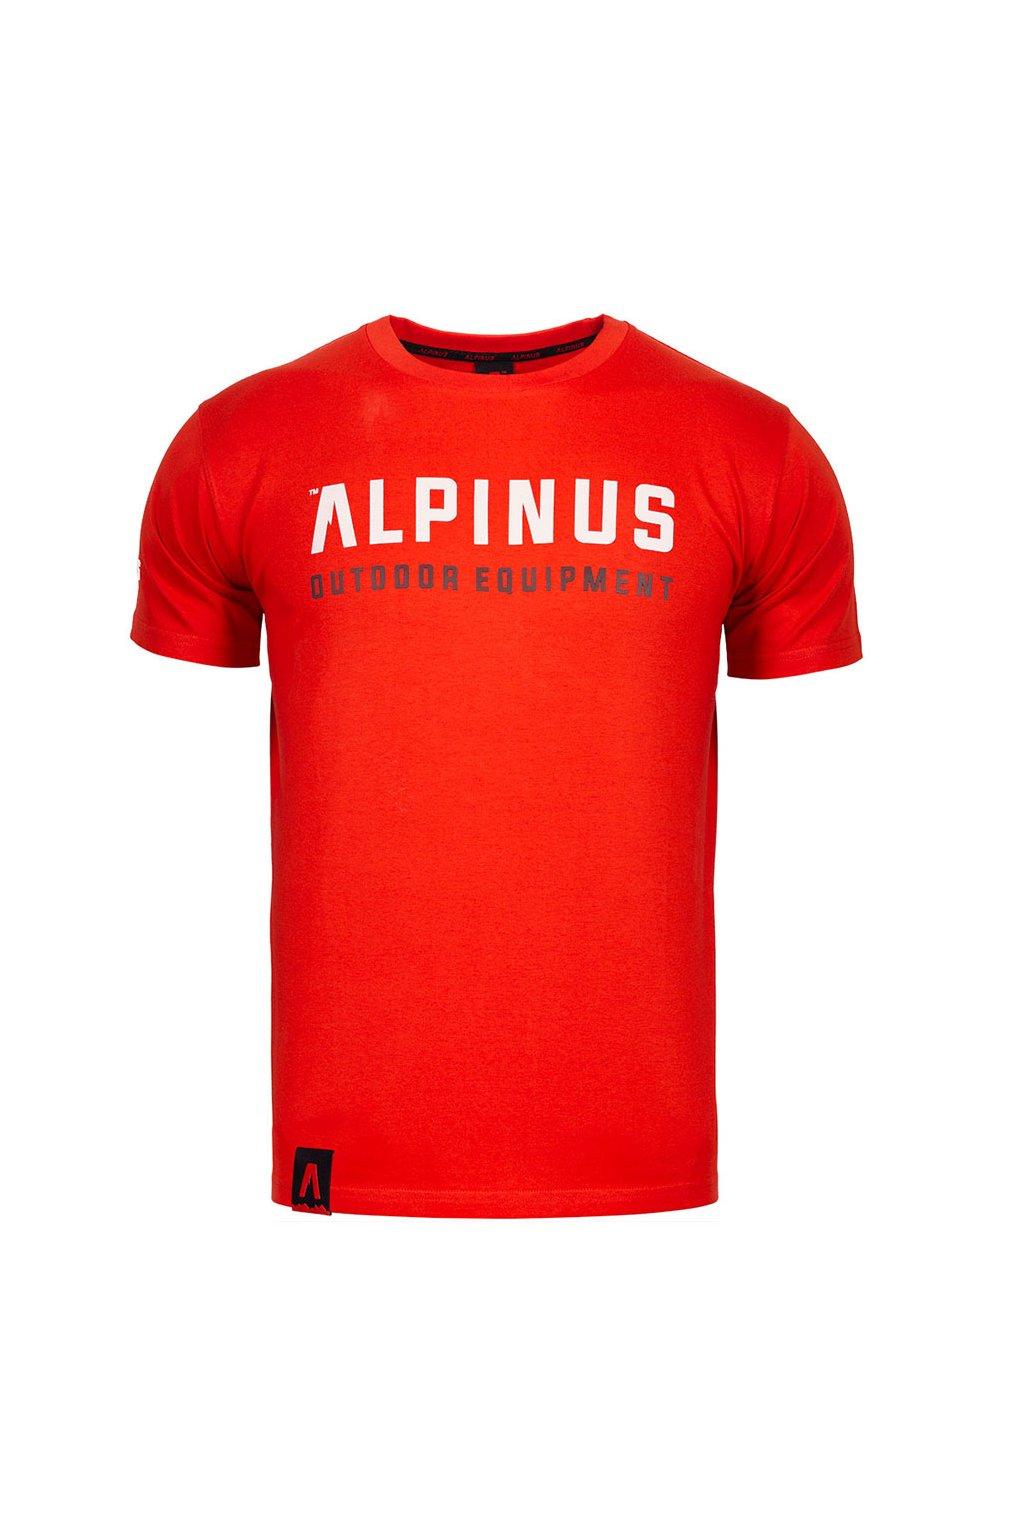 Pánske tričko Alpinus Outdoor Eqpt. červené ALP20TC0033